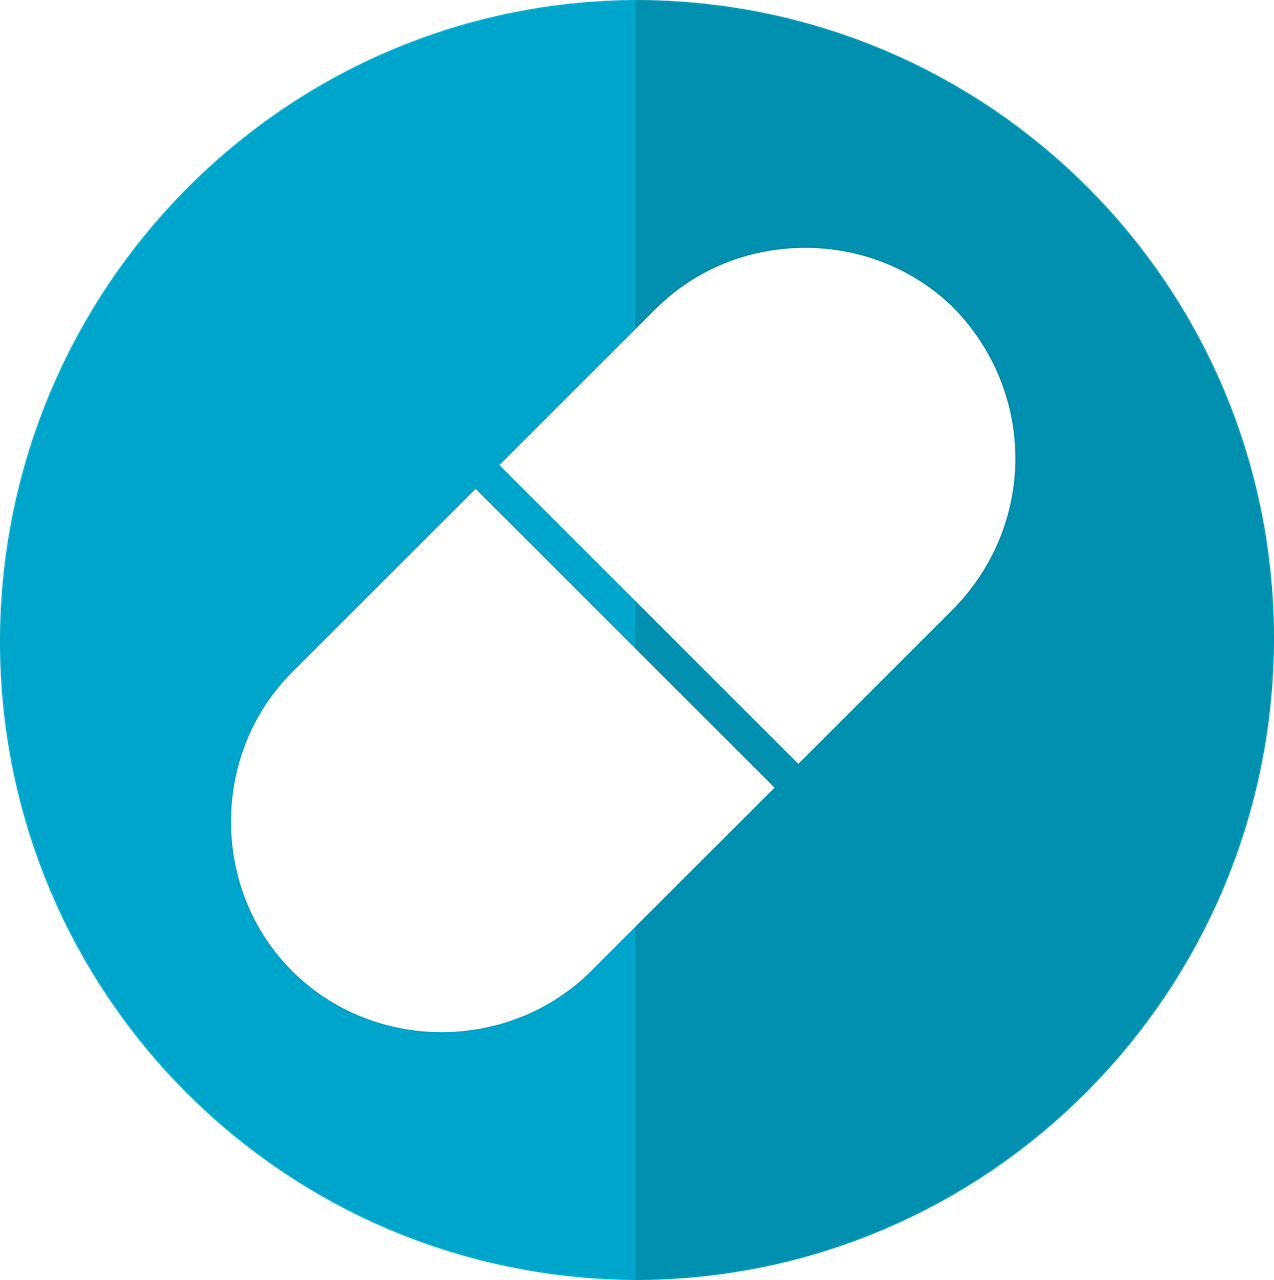 Mediq Apotheek Centraal Haarlem pharmacy